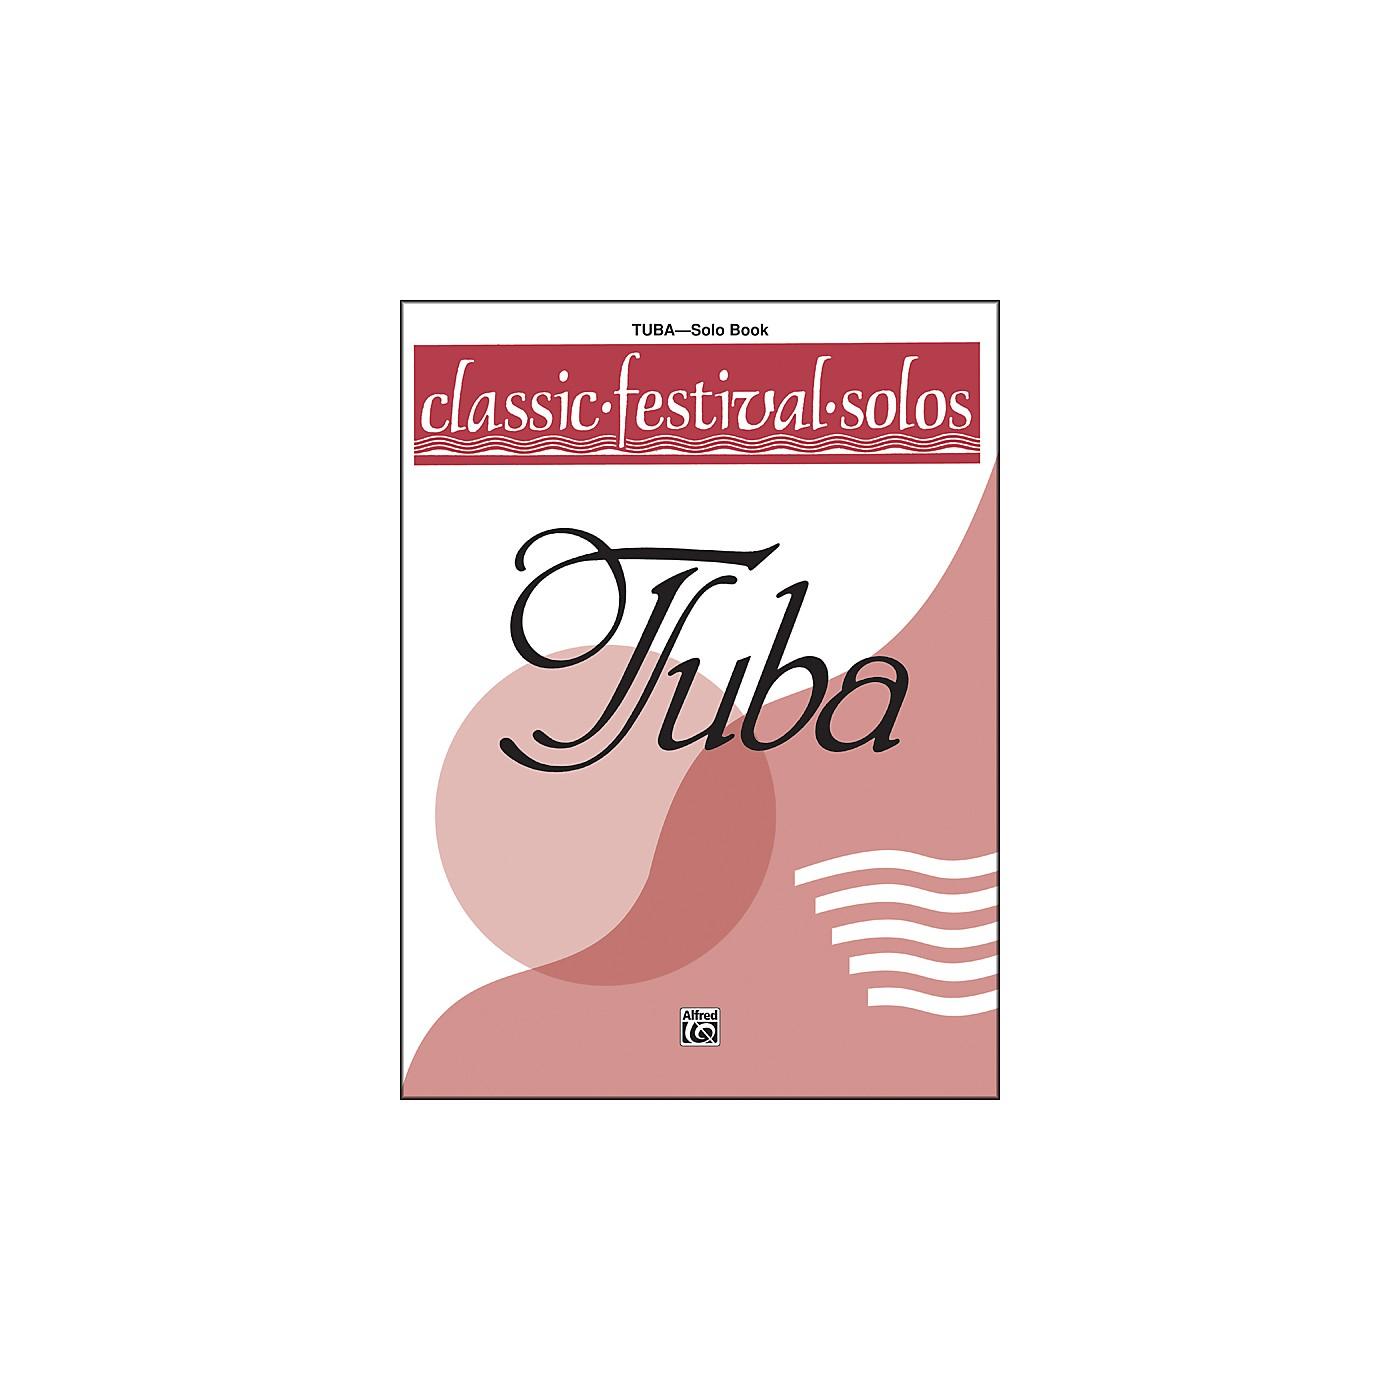 Alfred Classic Festival Solos (Tuba) Volume 1 Solo Book thumbnail